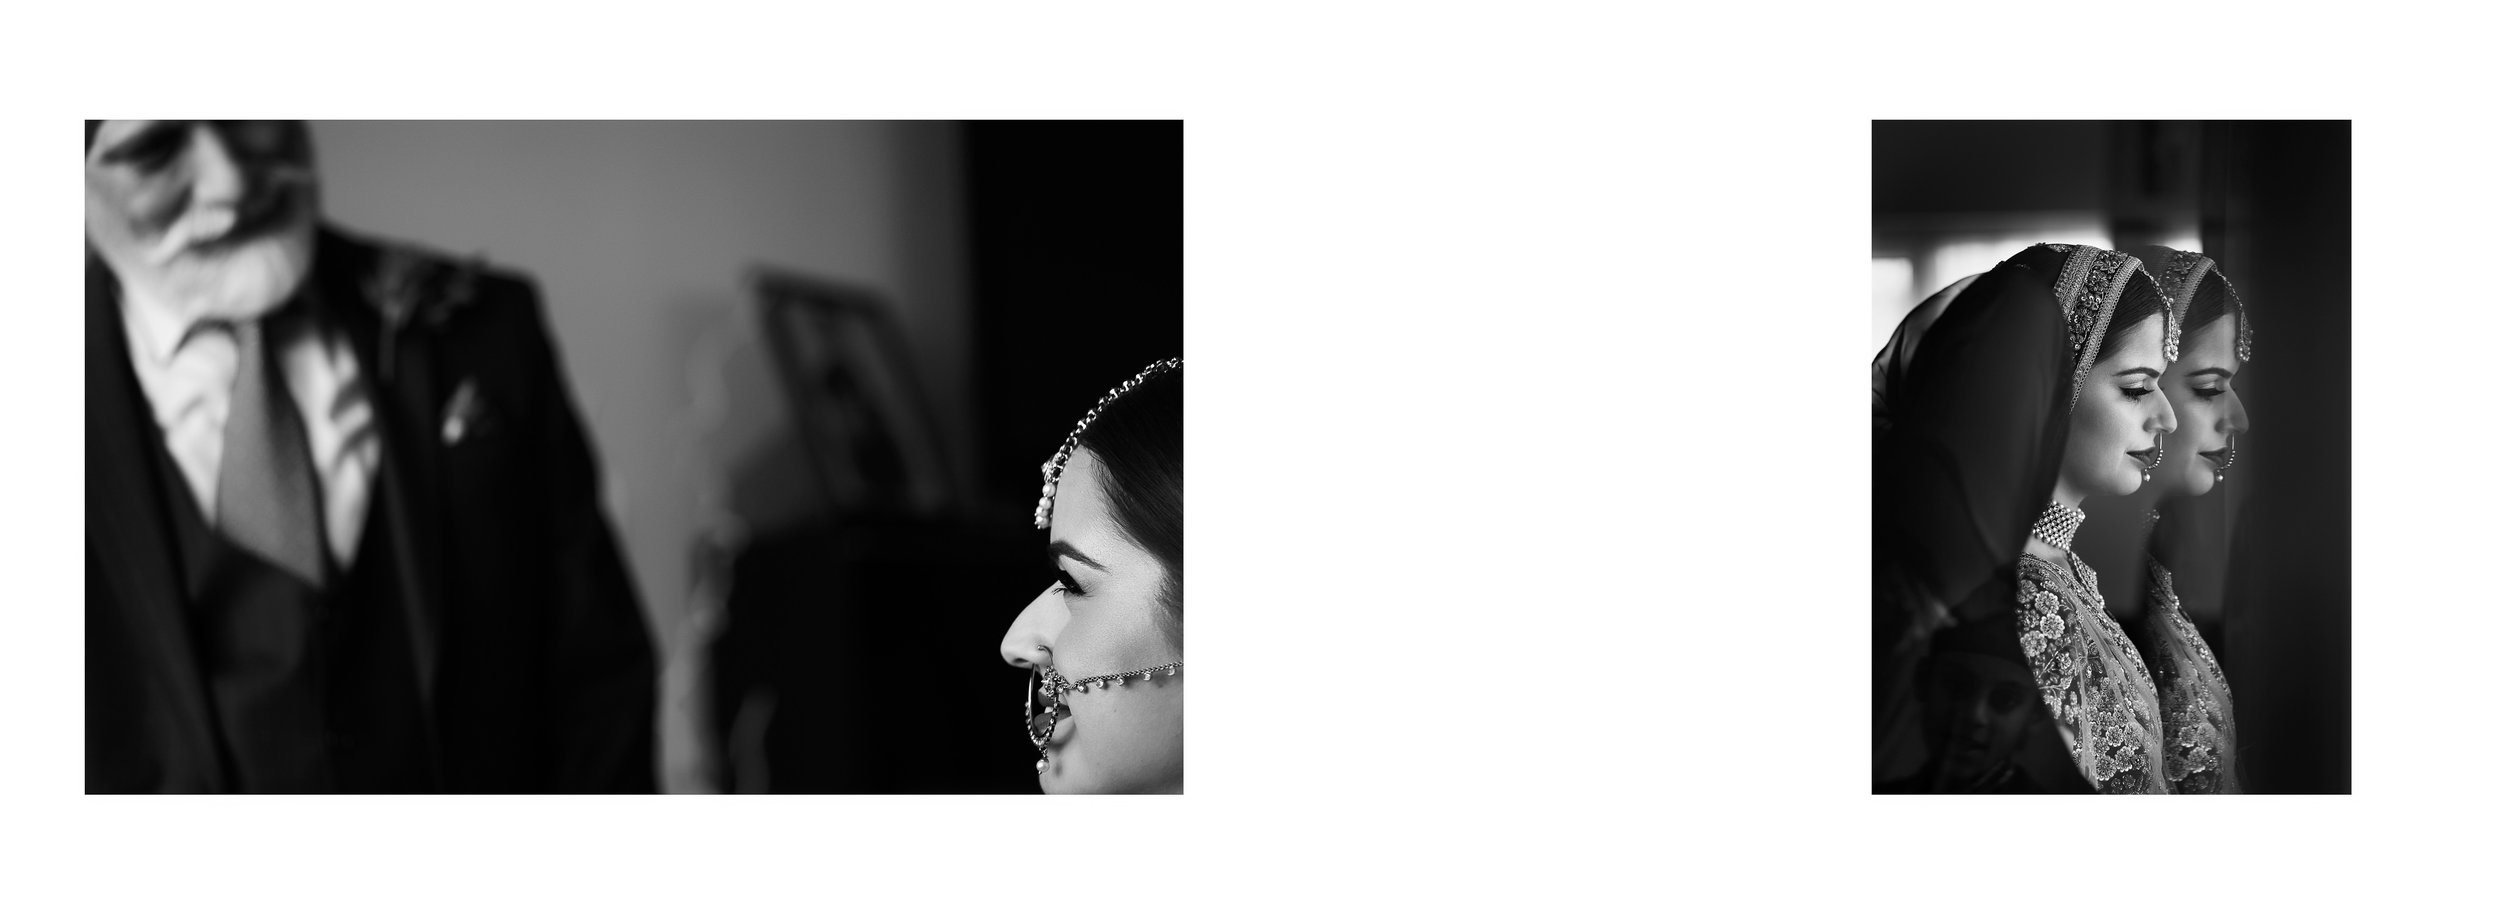 Sikh Wedding - Jaspreet and Indy-11.jpg